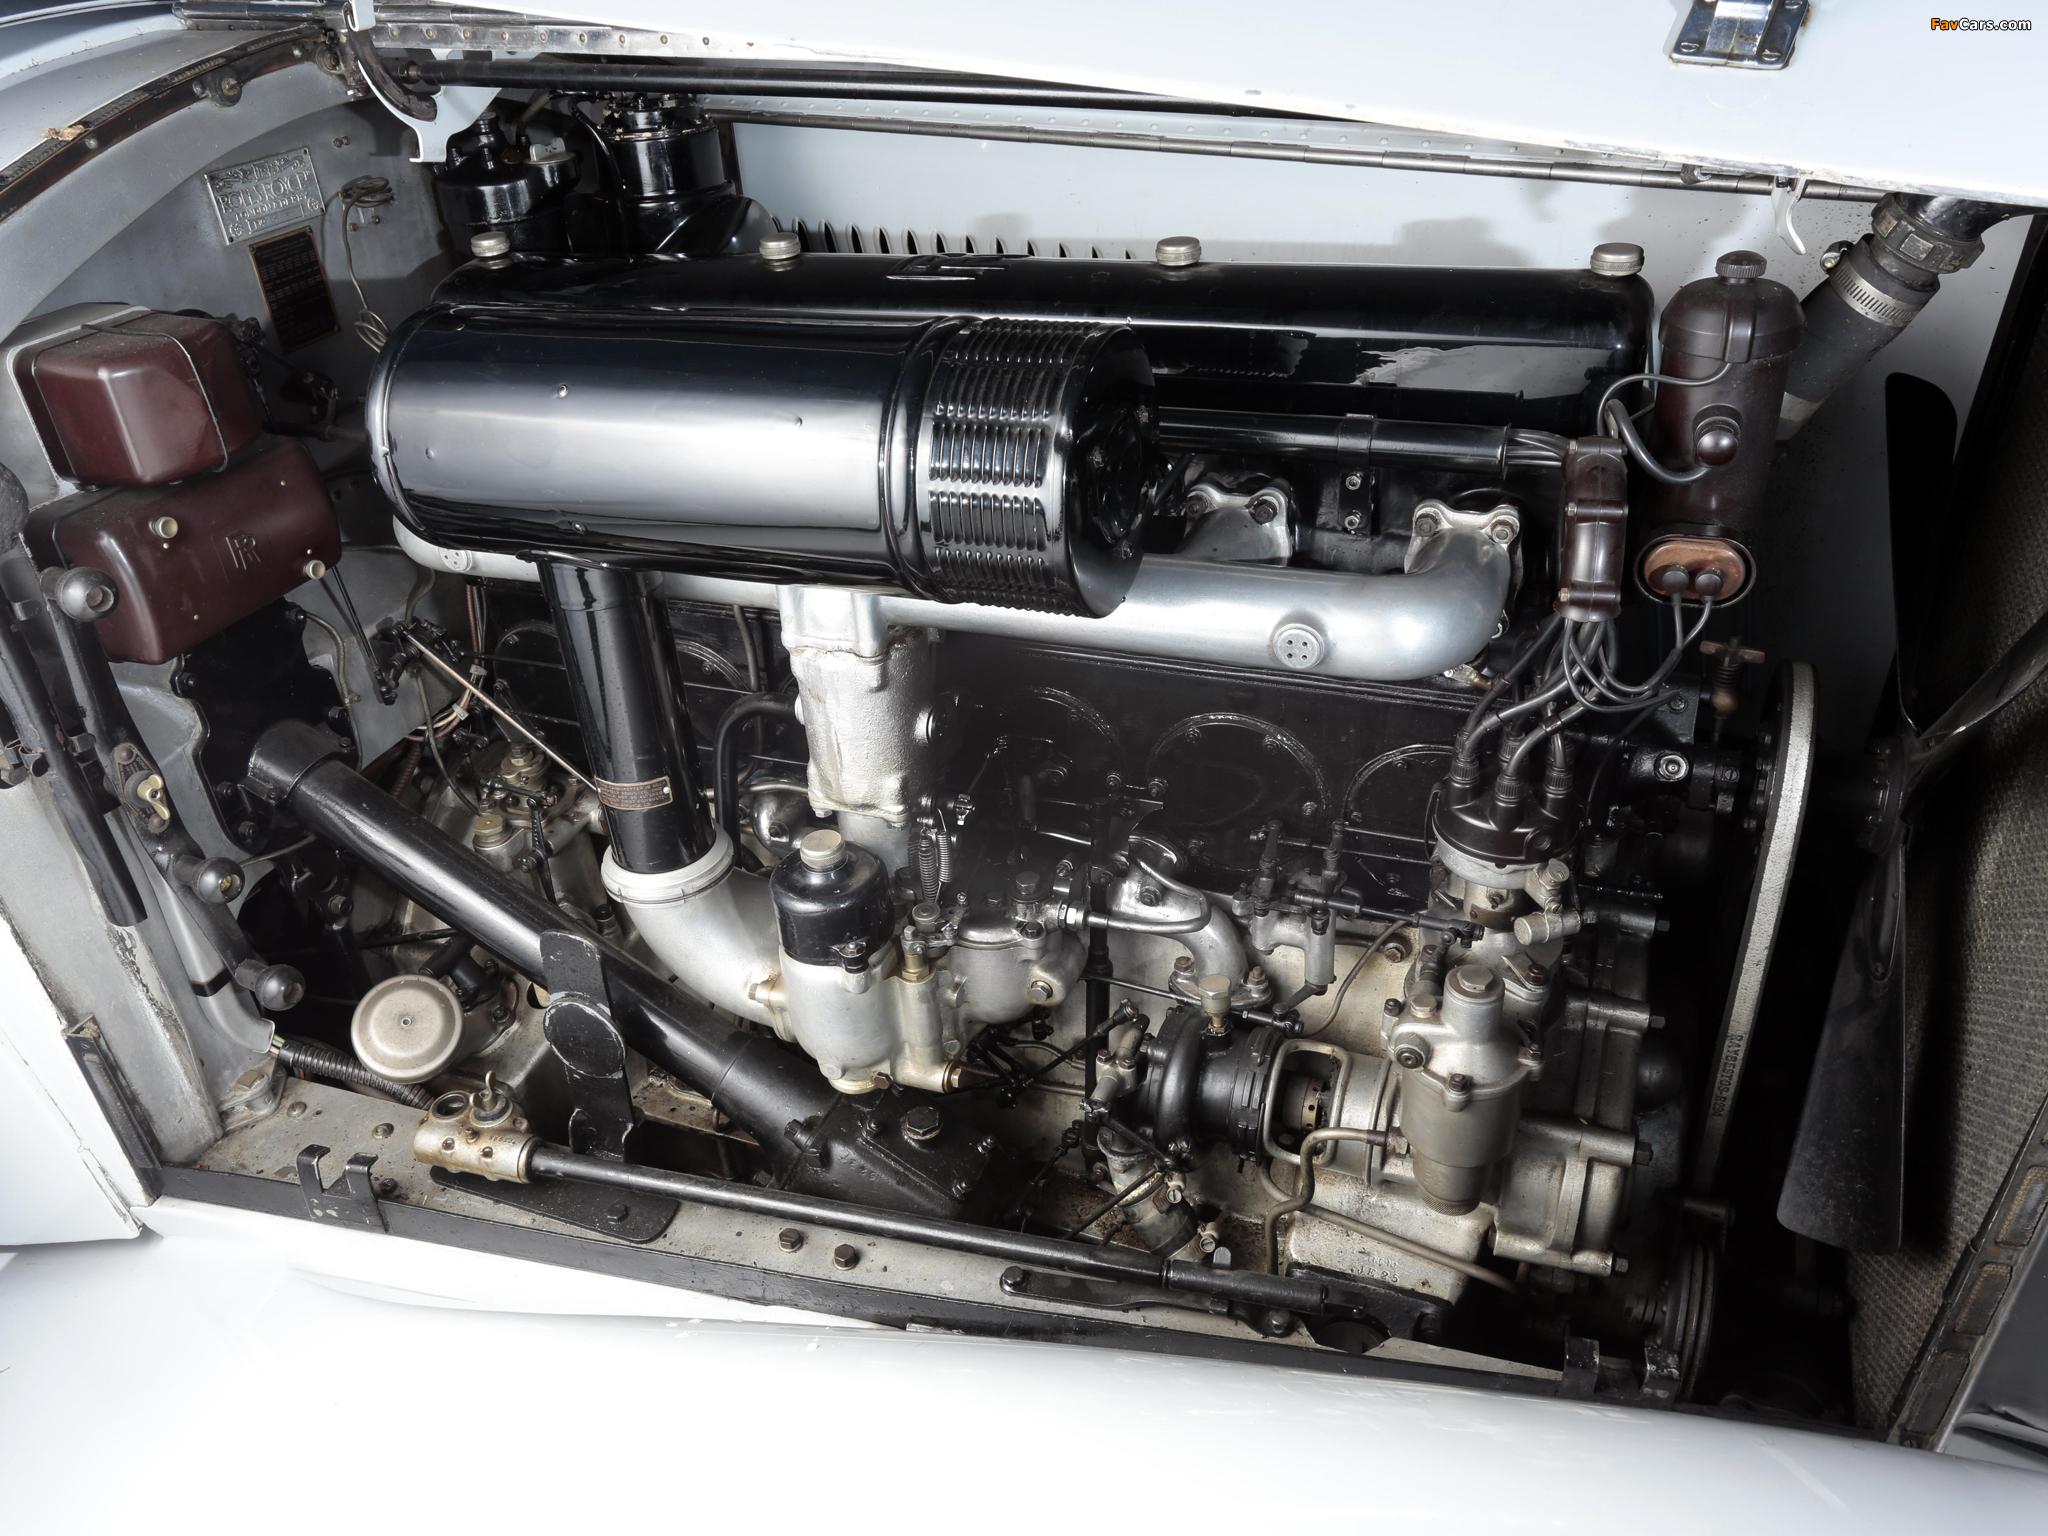 Rolls-Royce Phantom II 40/50 HP Continental Sports Saloon by Gurney Nutting 1934 wallpapers (2048 x 1536)